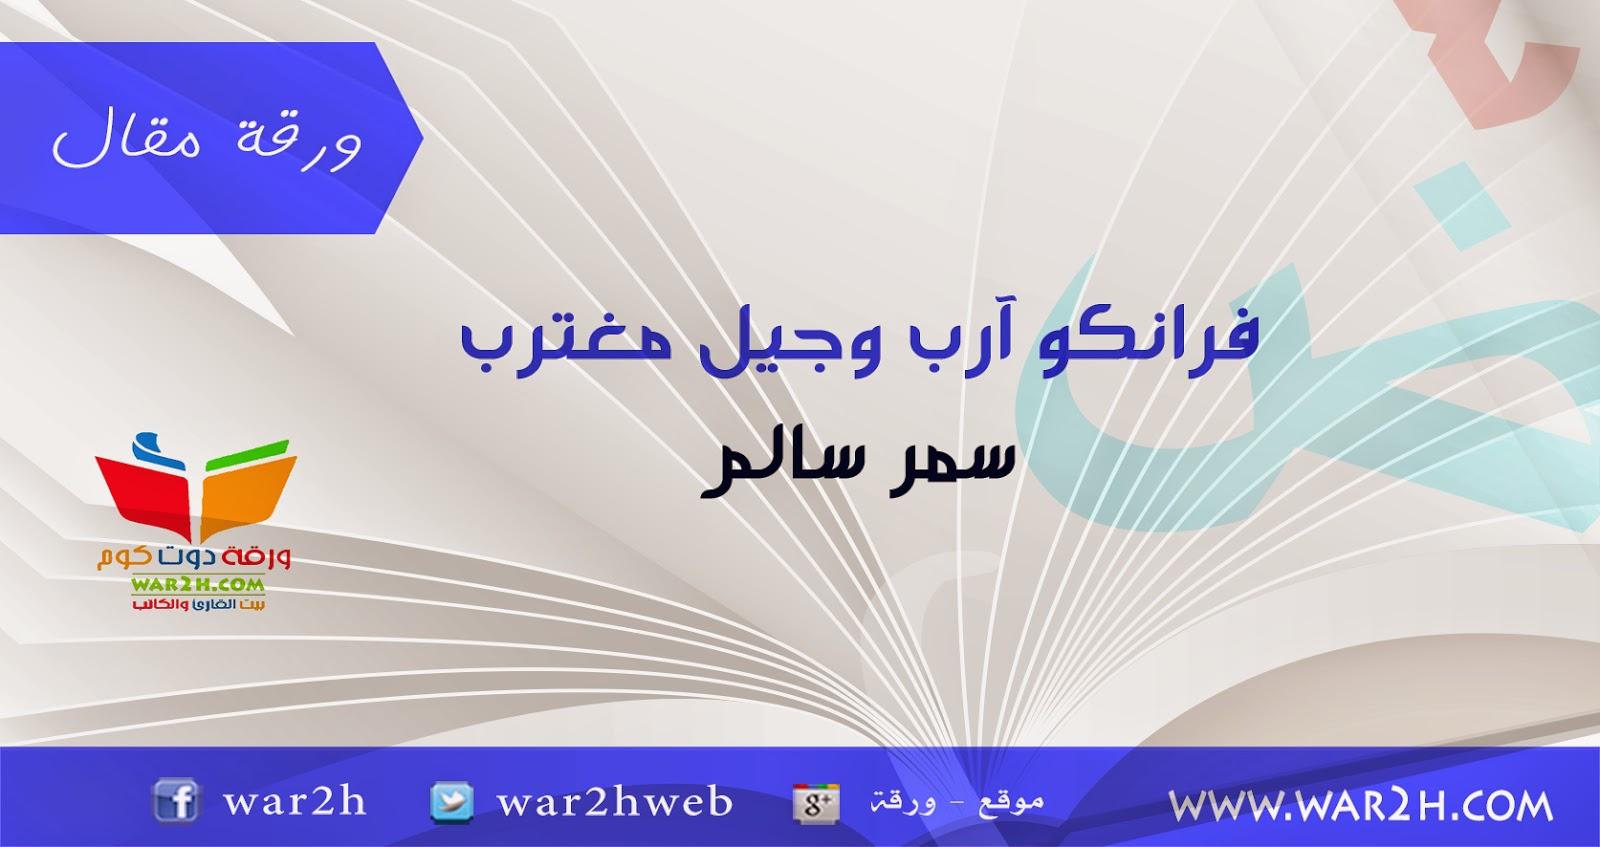 بالصور ماهو الفرانكو اراب؟ ادخل واعرف 20160623 821